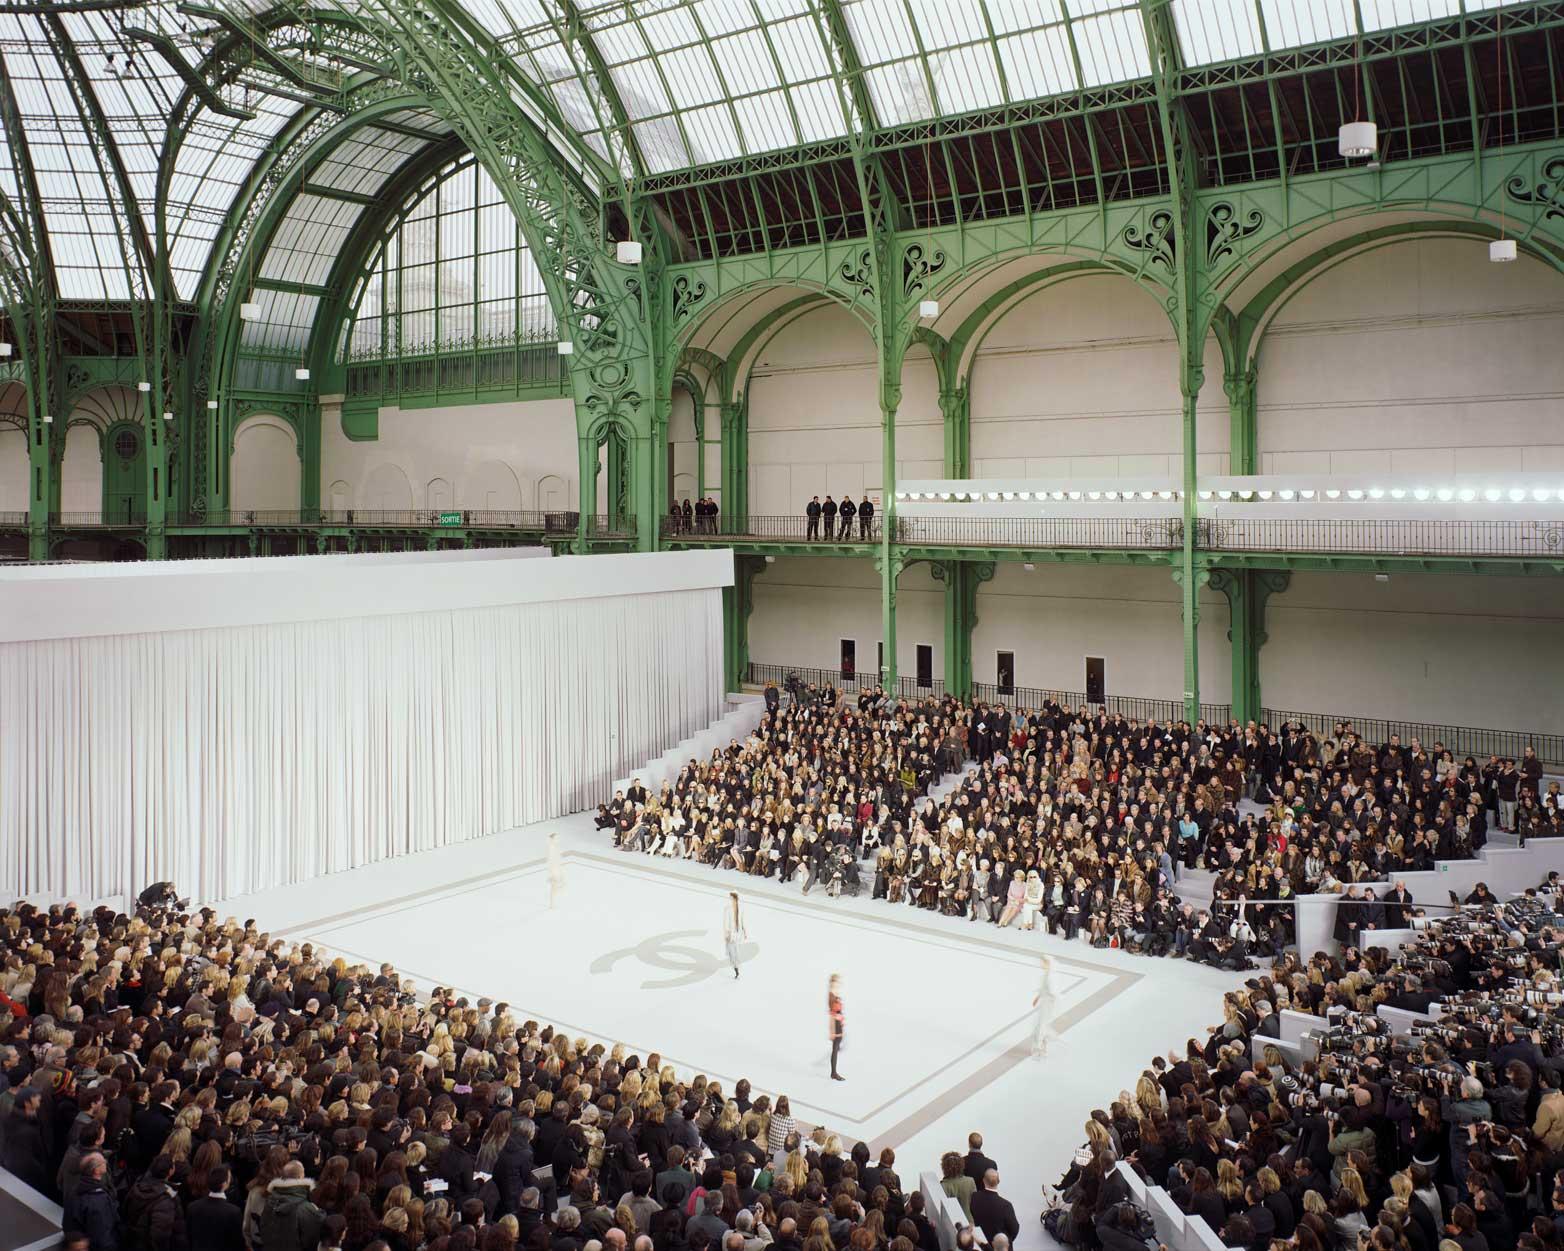 Grand Palais, Chanel 2, 2007